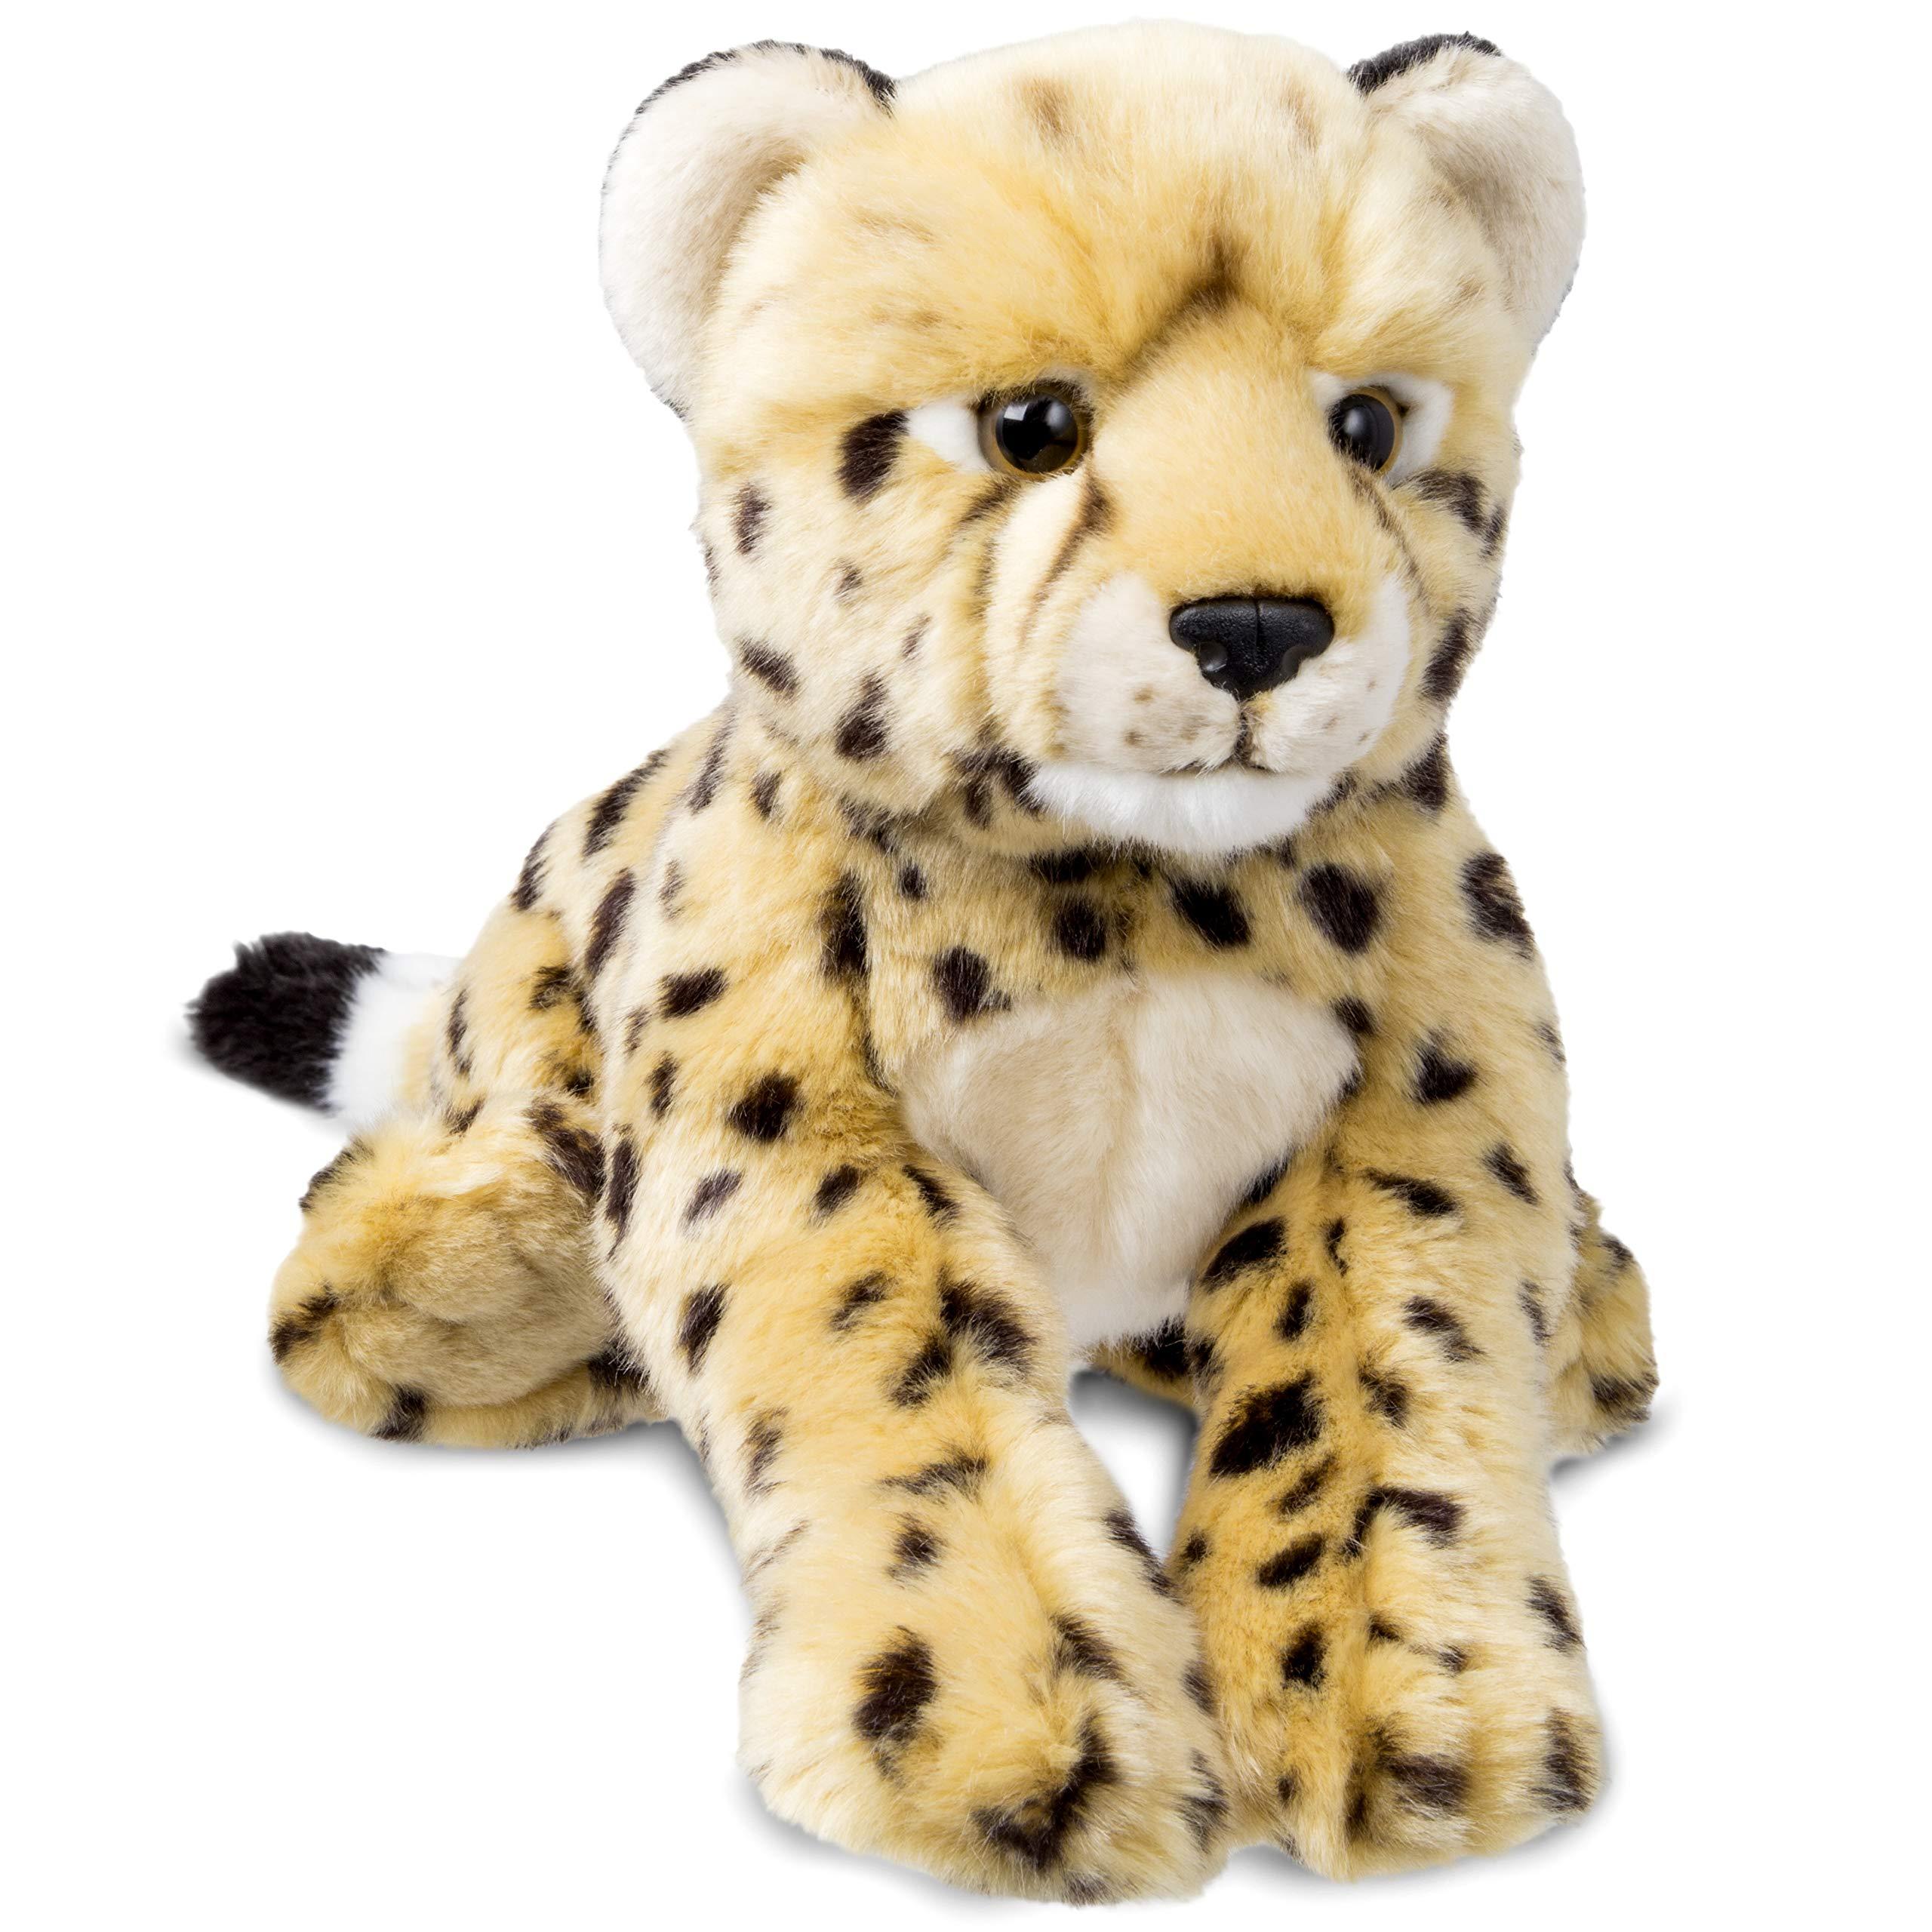 FAO Schwarz Cheetah Cub Stuffed Animal Toy Plush, Ultra Soft & Snuggly Doll for Creative & Imagination Play, 12'' by FAO Schwarz